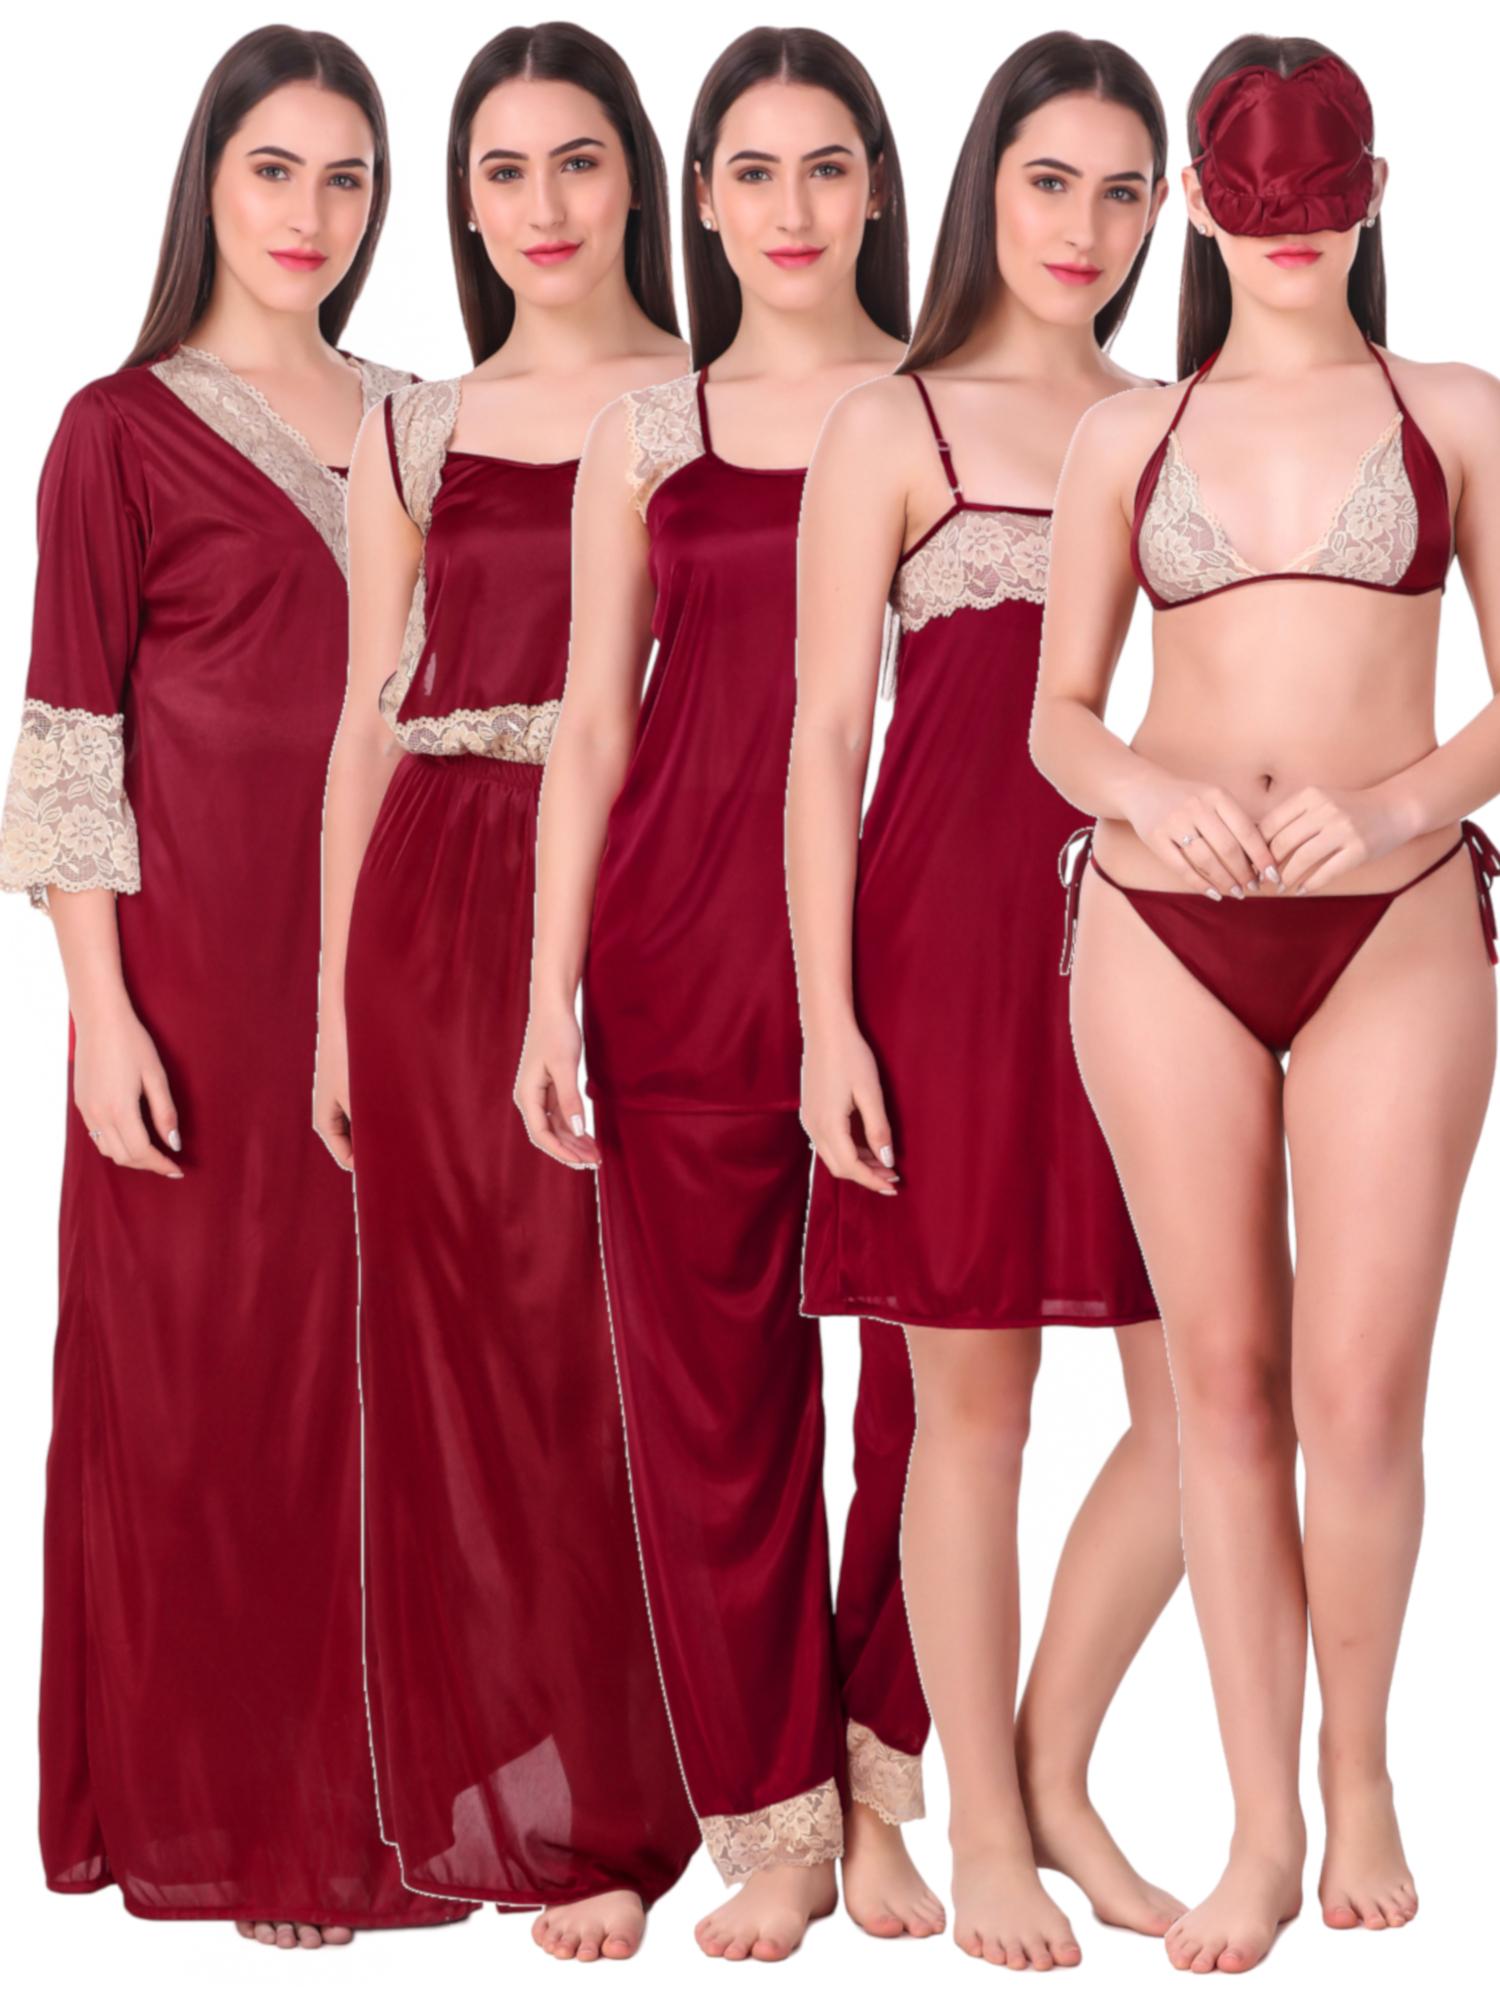 Combo Pack Of 8 Pcs Satin Spandex Lace Soft Nighty Lingerie Nightwear Set